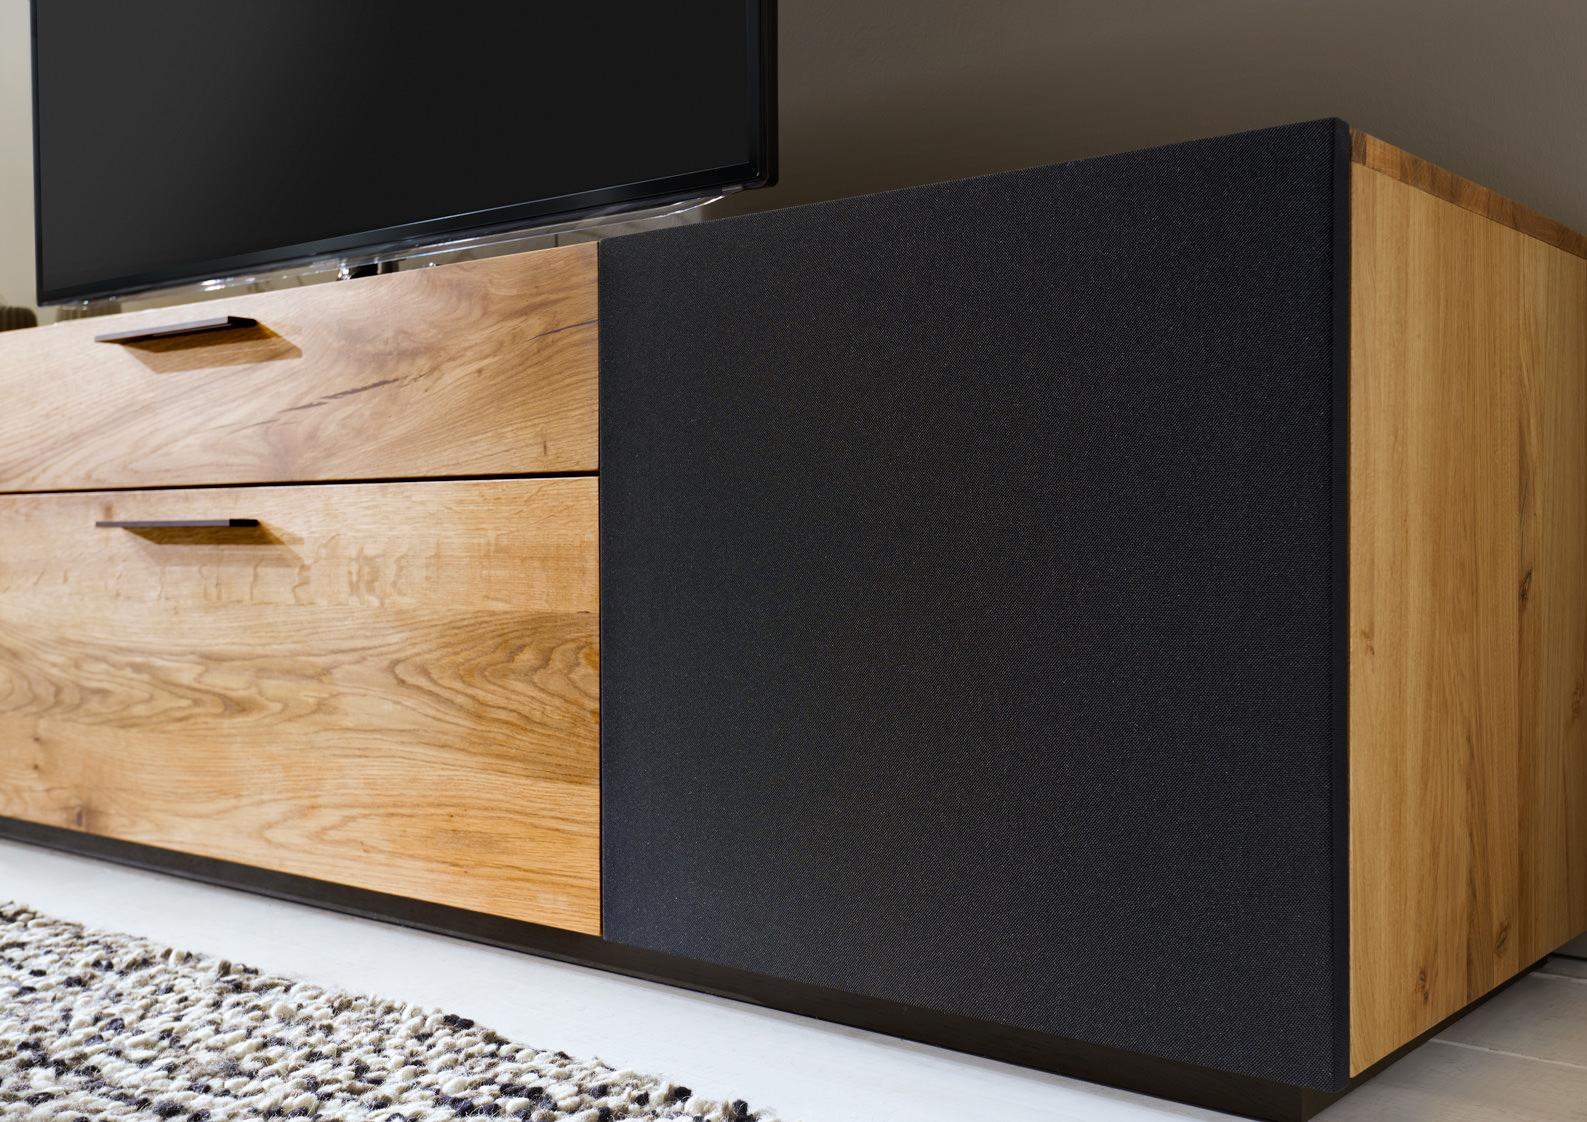 reveno asteiche massiv eichenscheune bocholt. Black Bedroom Furniture Sets. Home Design Ideas